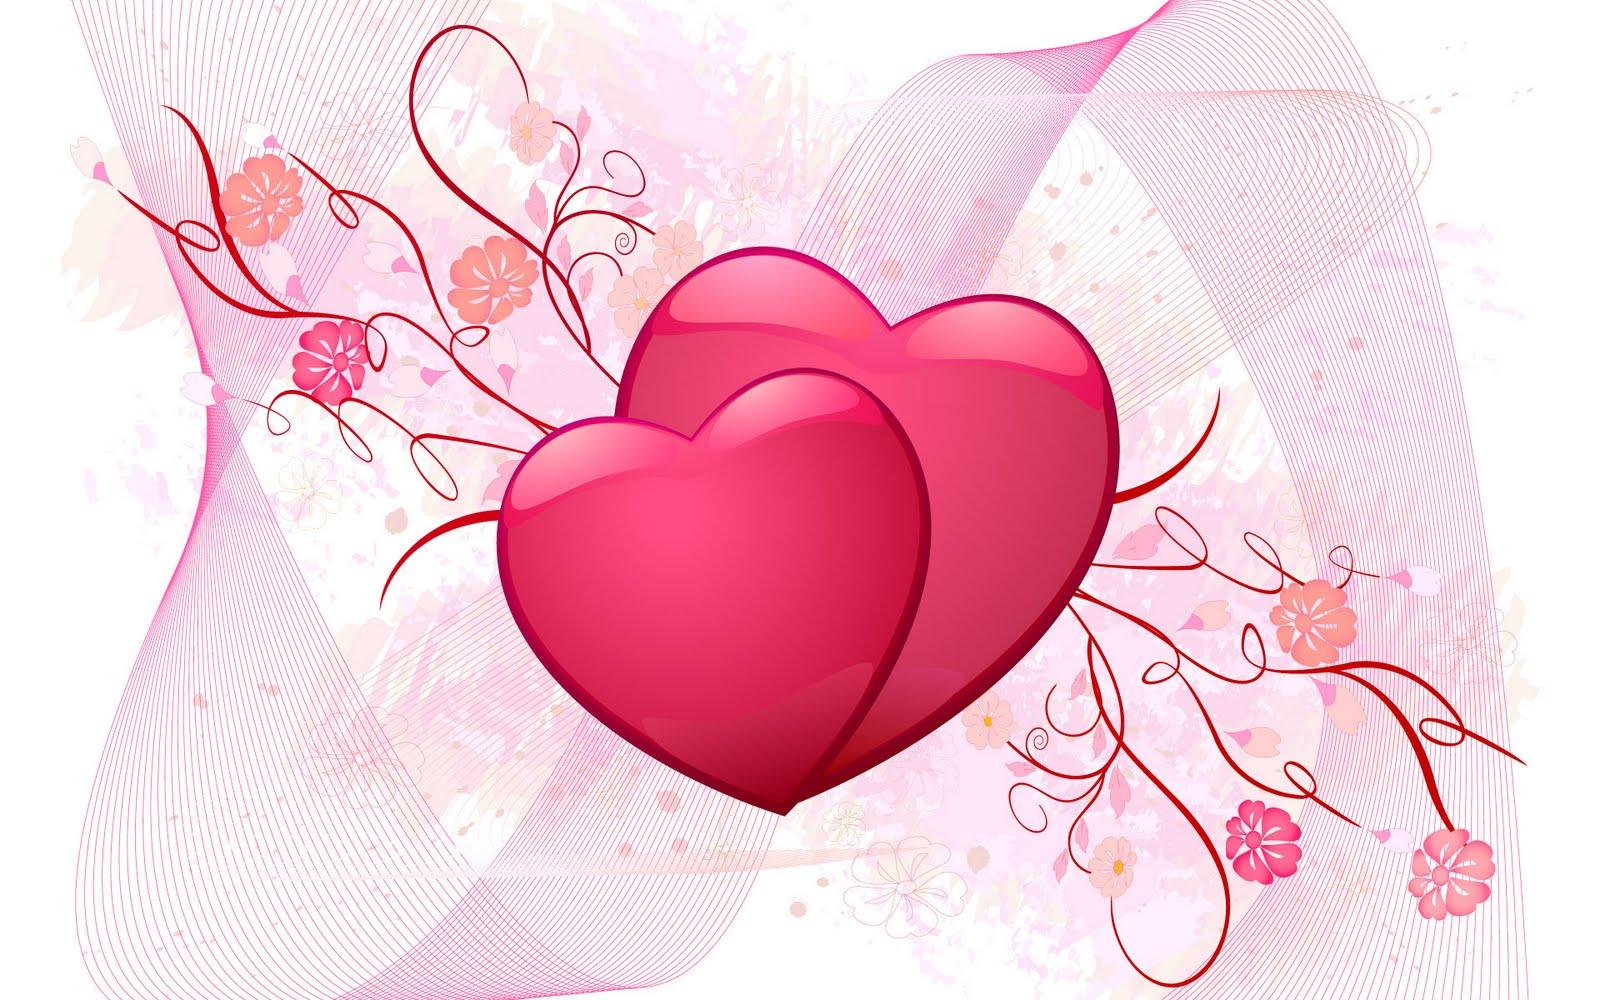 http://1.bp.blogspot.com/-_Mf0CdJo2nE/Tehk_6xjsiI/AAAAAAAABoI/d1FMGvFtOxg/s1600/Love+pink+wallpaper.jpg